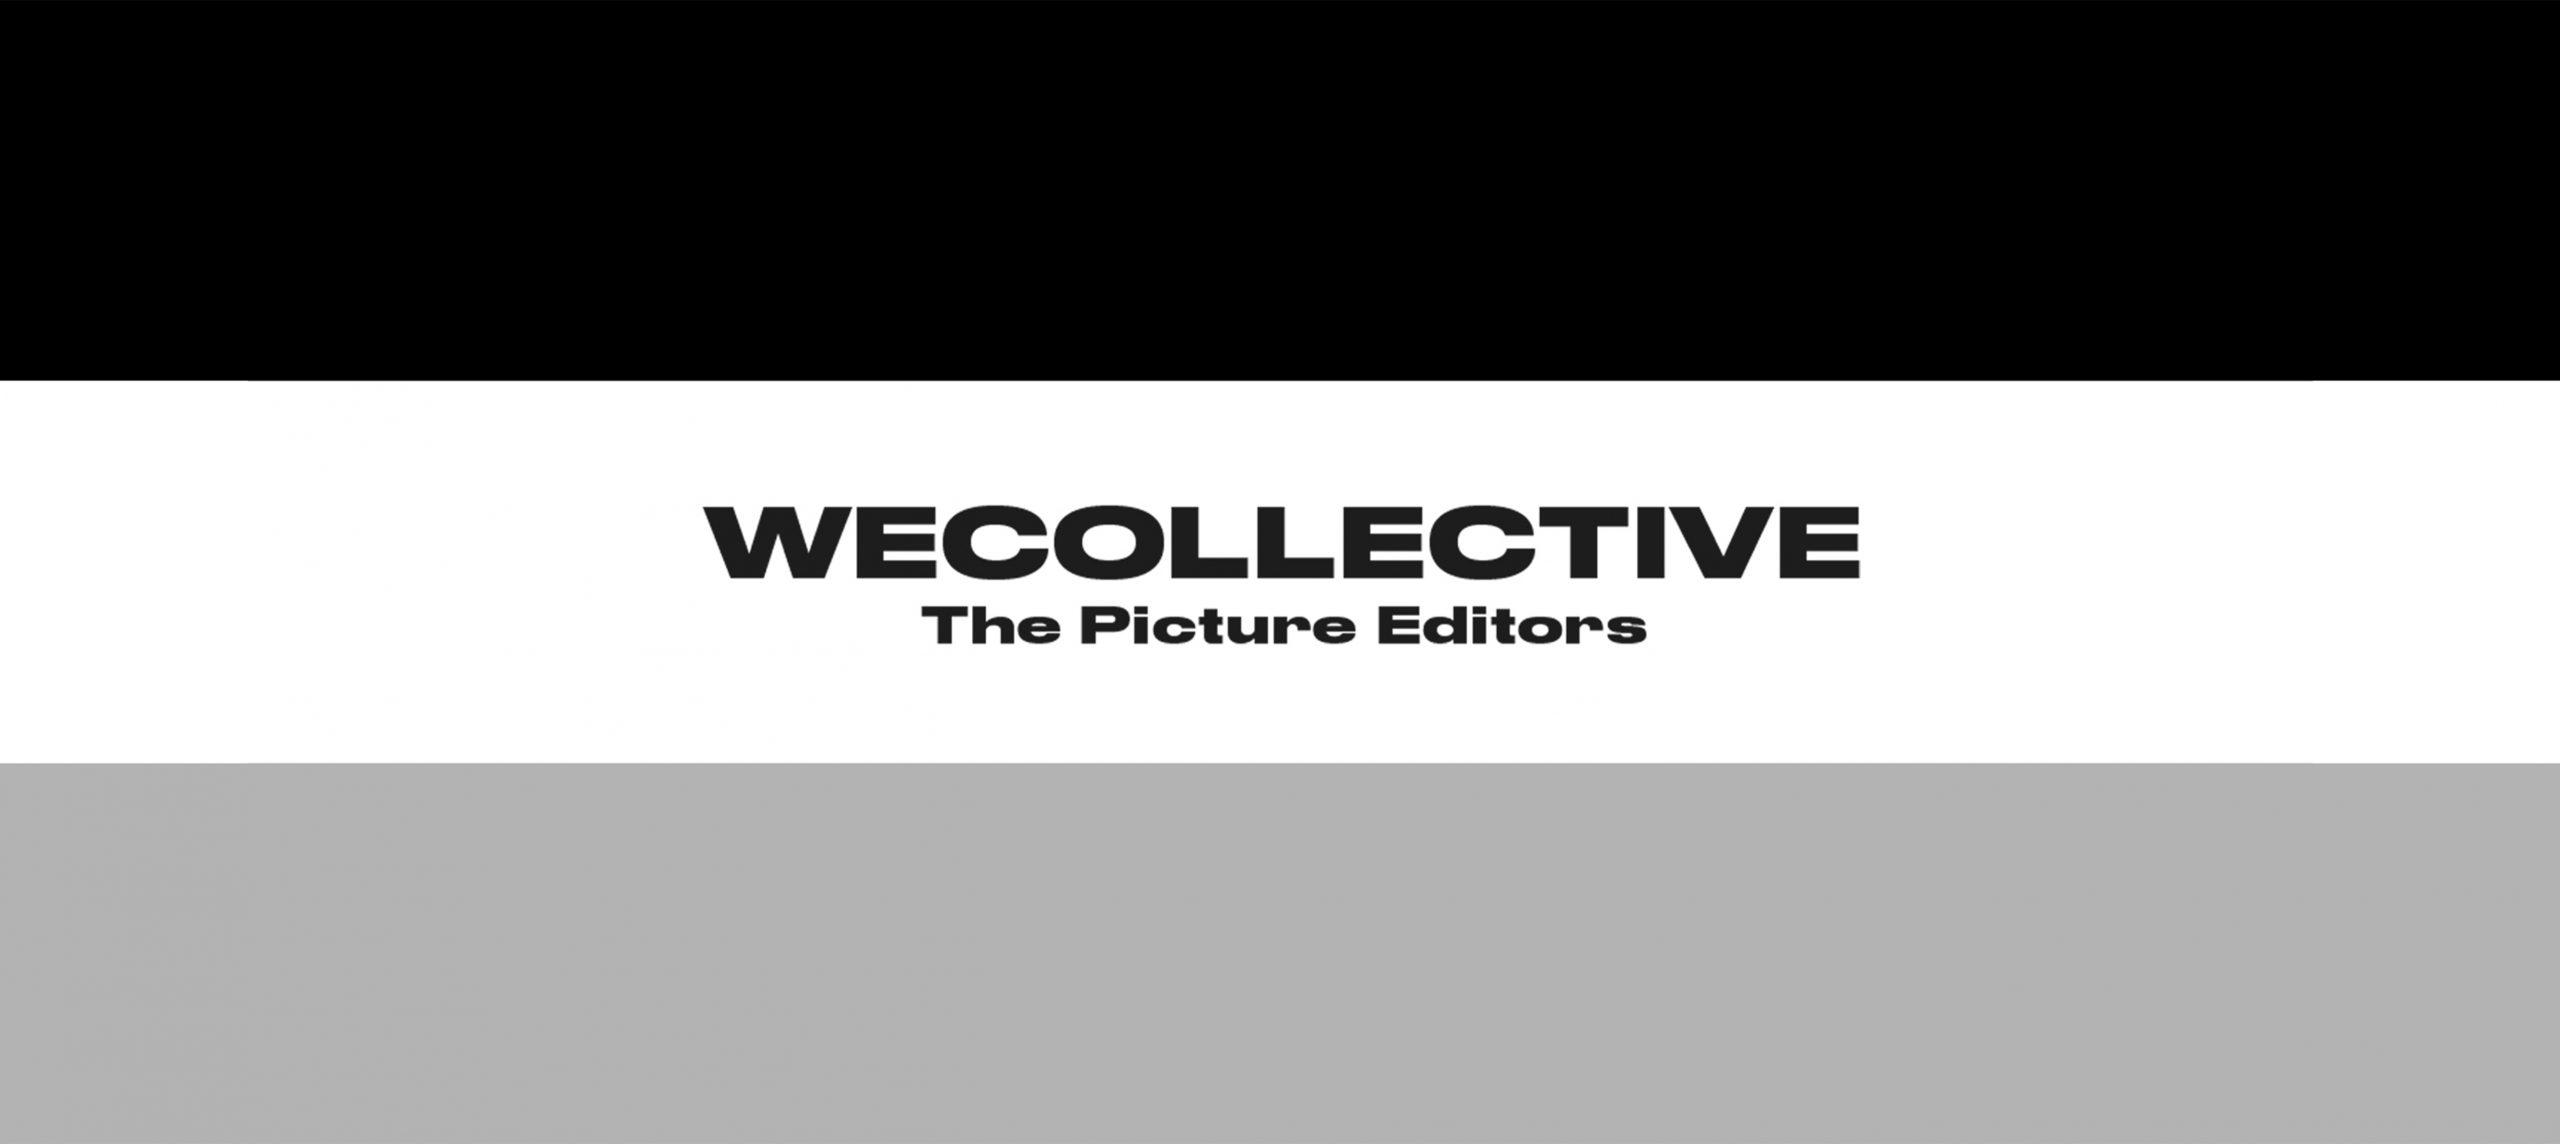 Studio Last - WeCollective – The Picture Editors